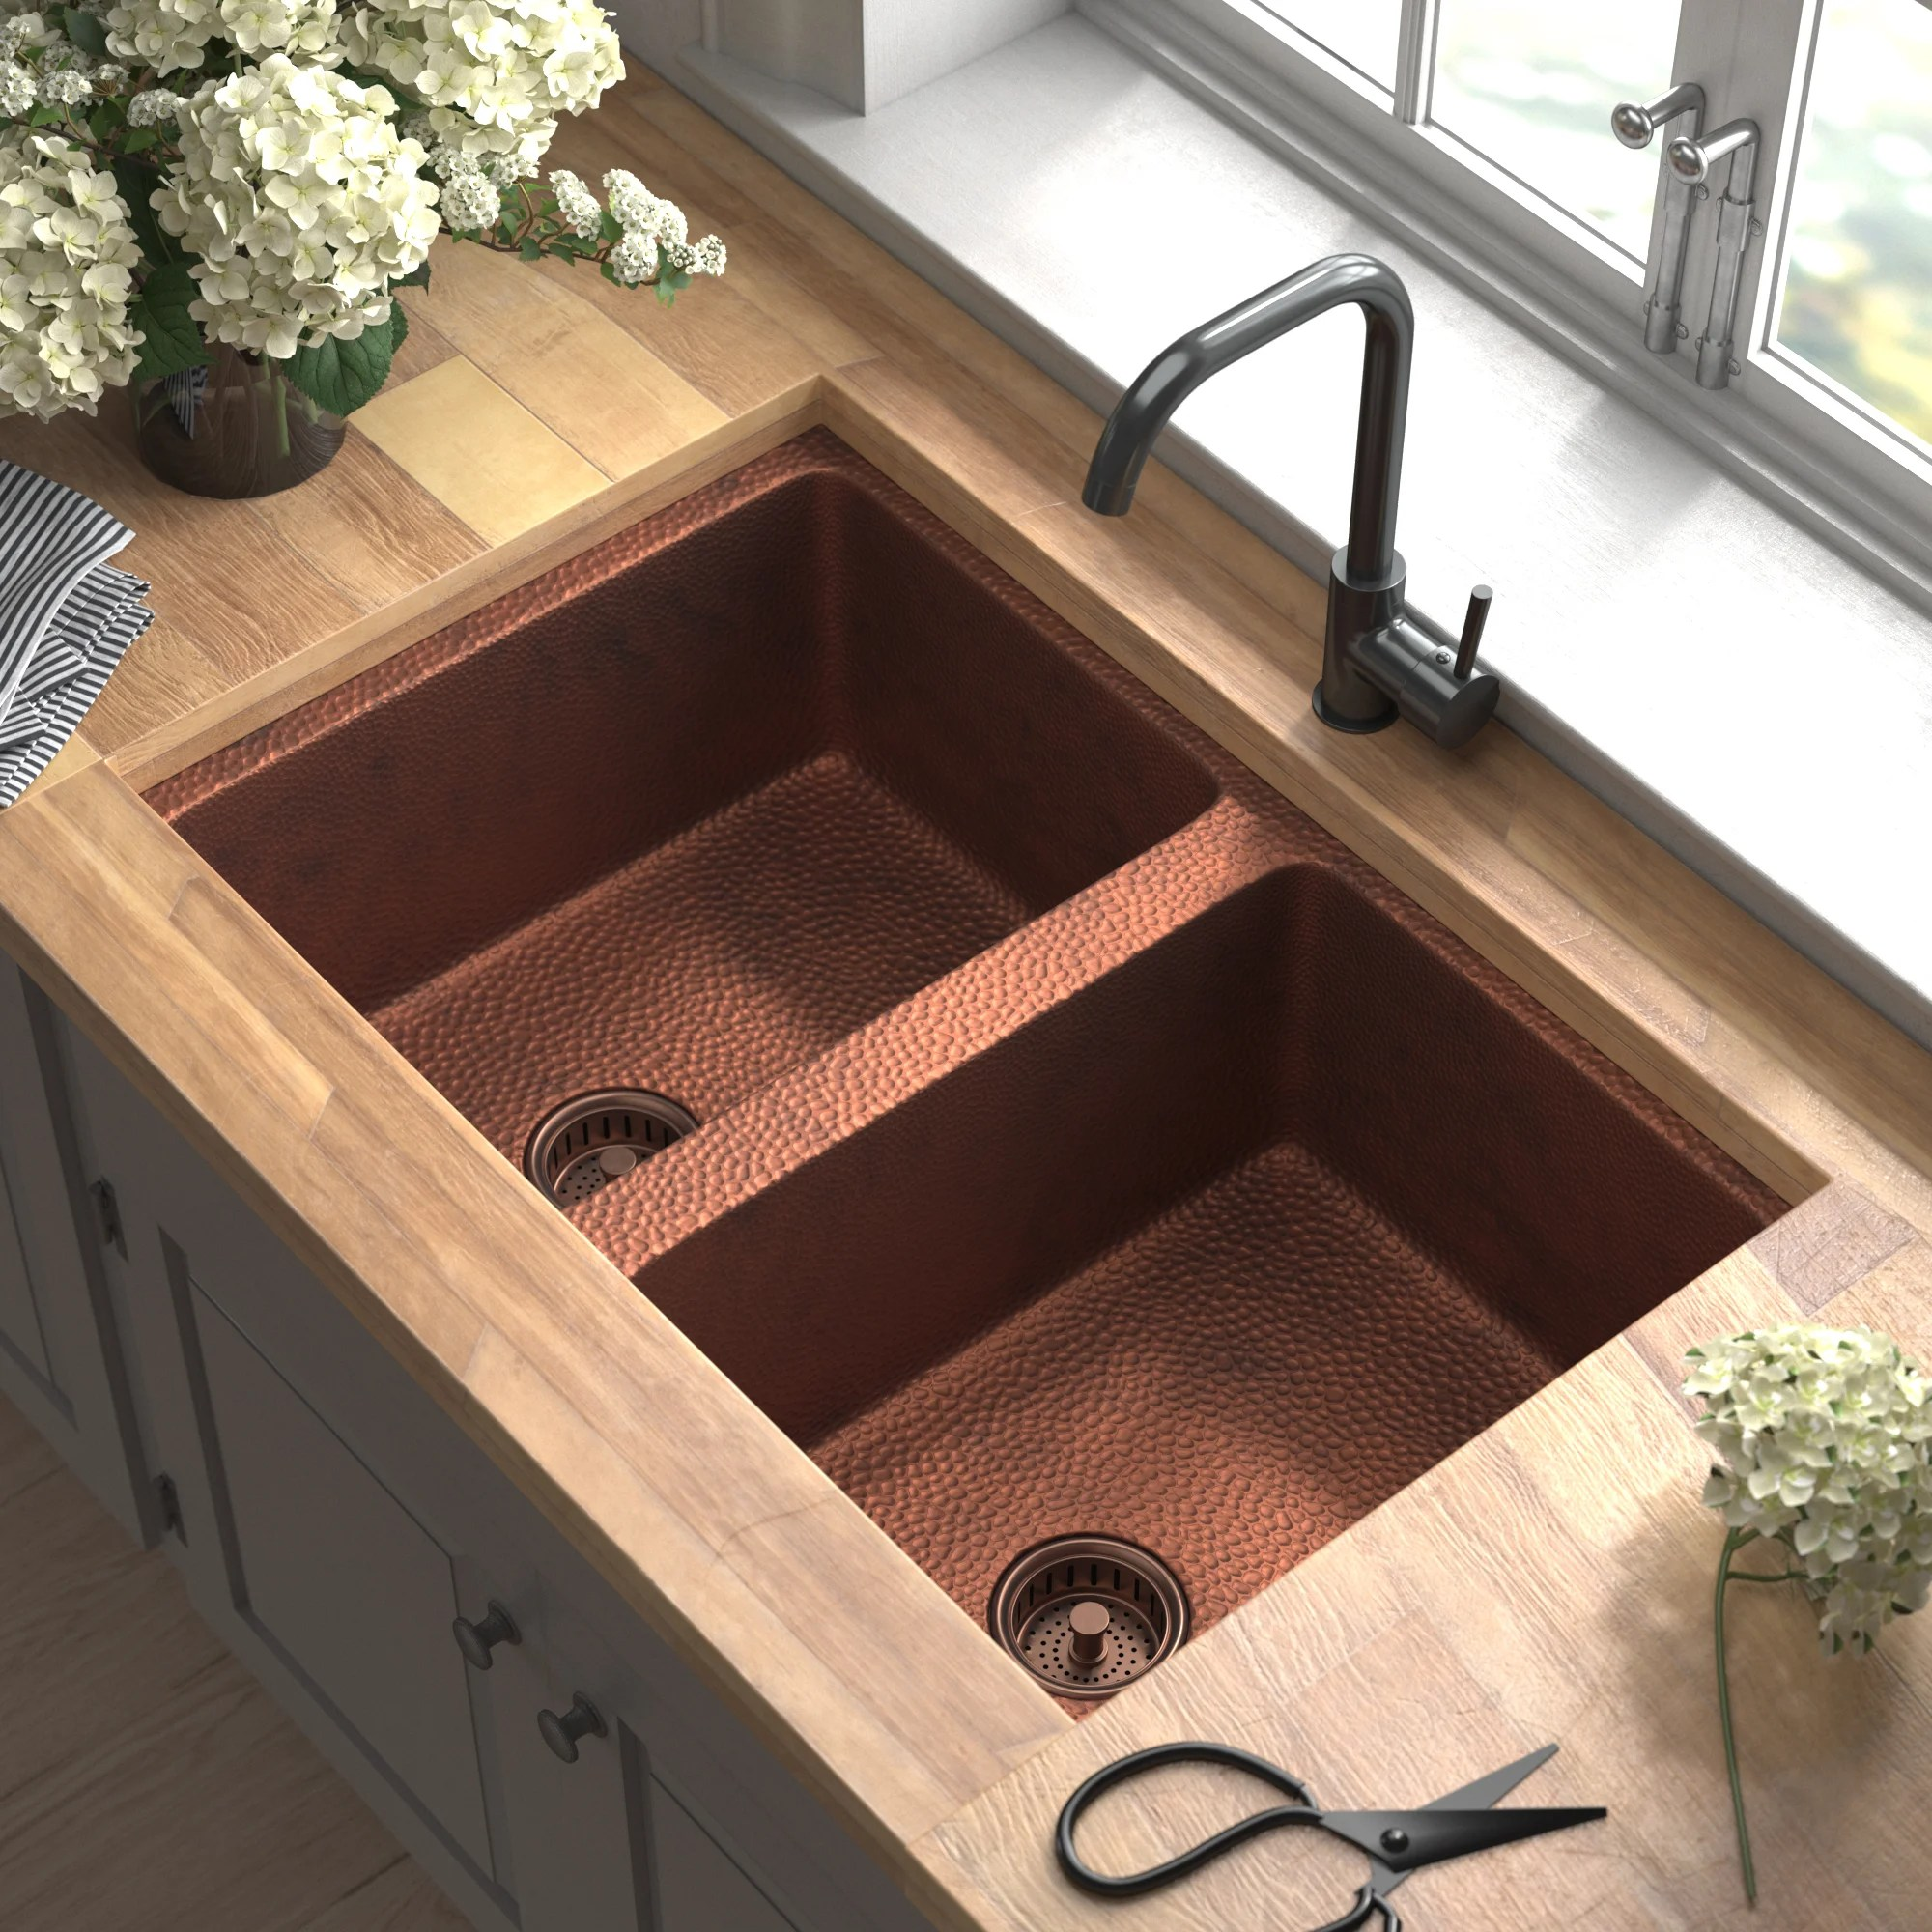 evgeniya copper 33 l x 22 w double basin undermount kitchen sink with drain assembly